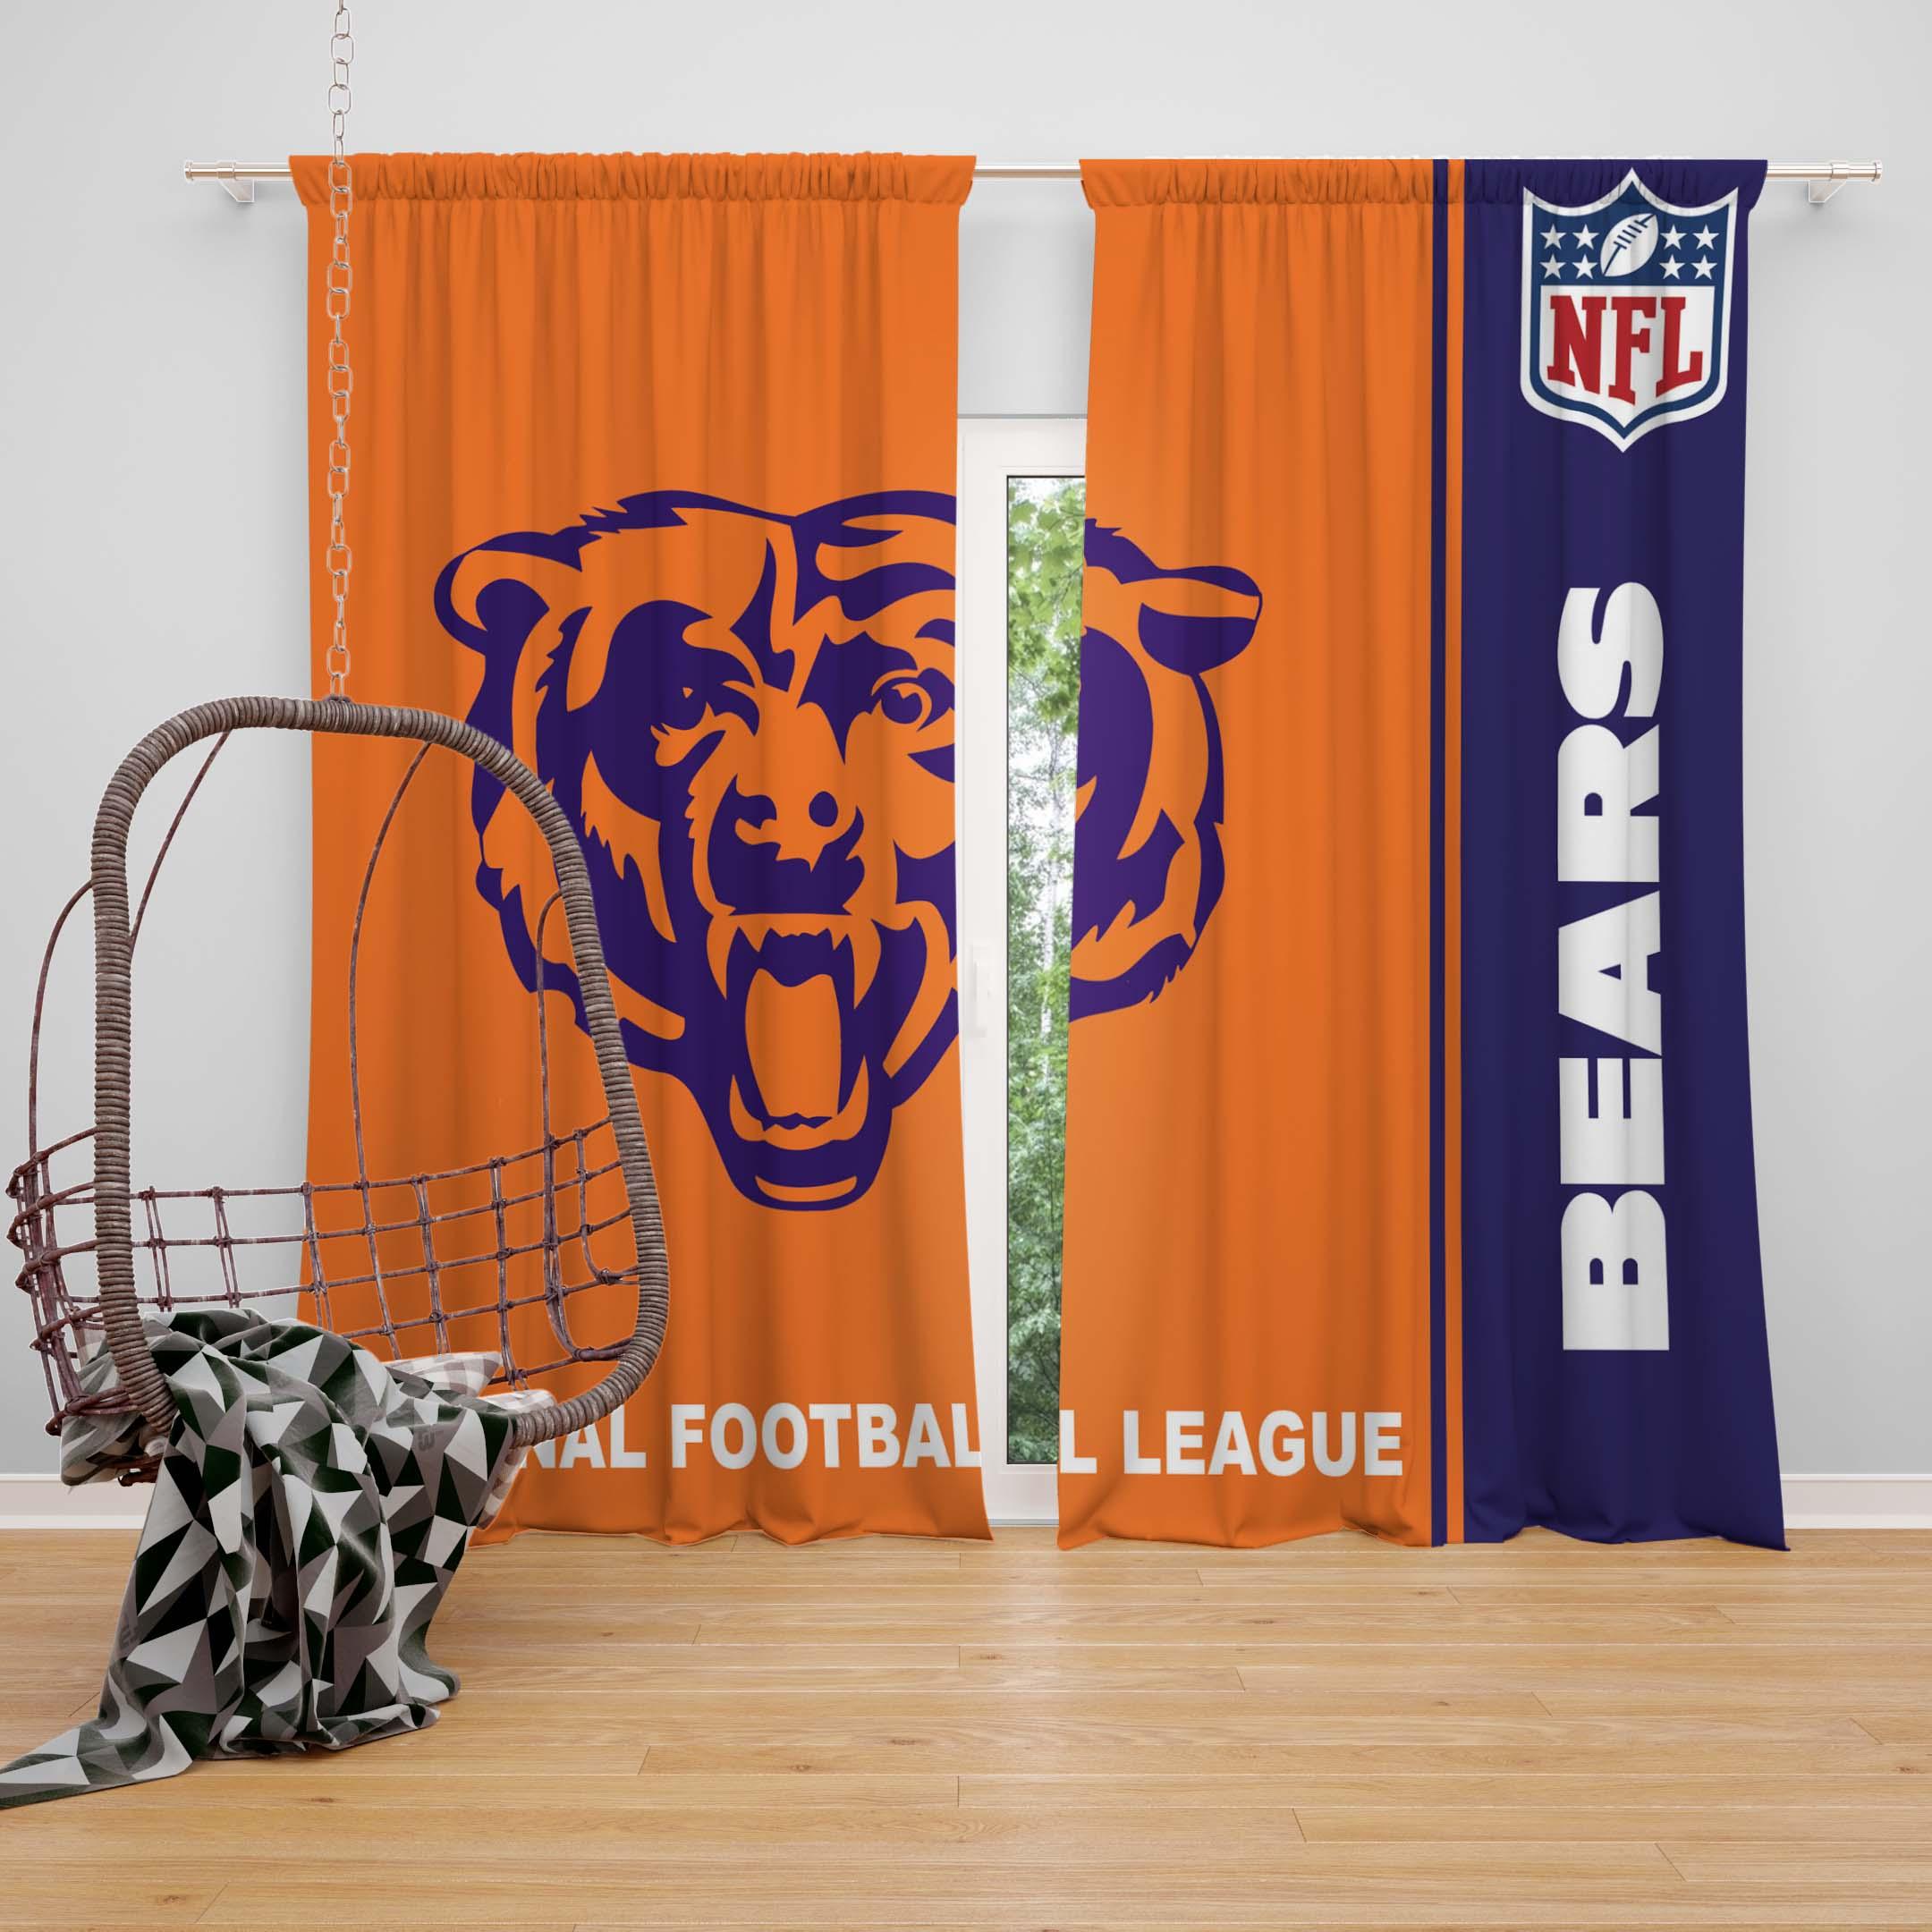 Nfl Chicago Bears Bedroom Curtain Ebeddingsets